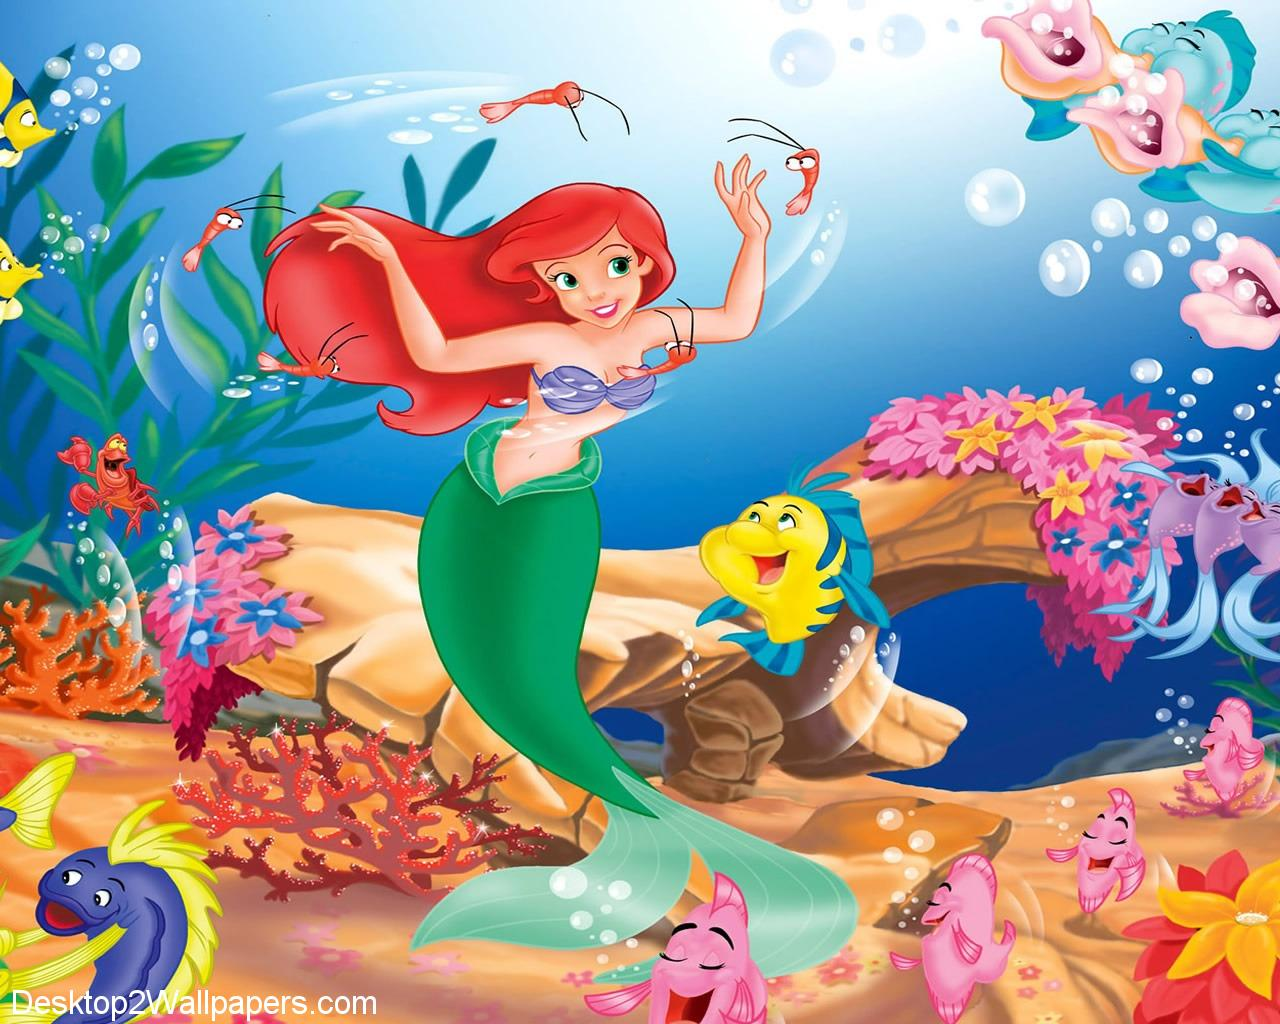 LOVE QUOTES: free cartoon wallpaper download